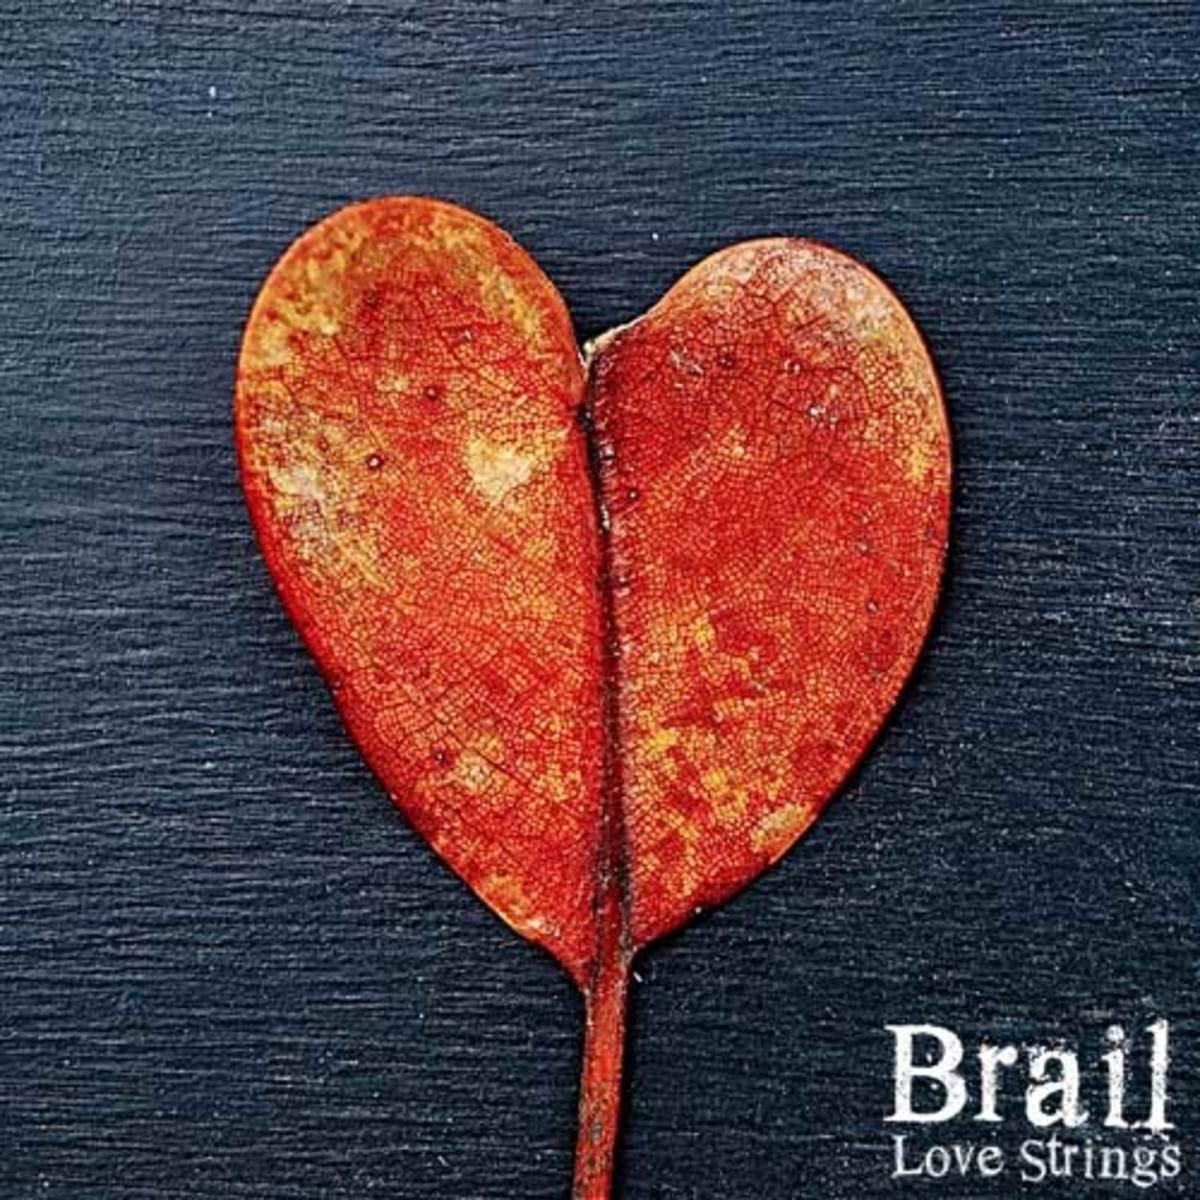 brail-lovestrings.jpg